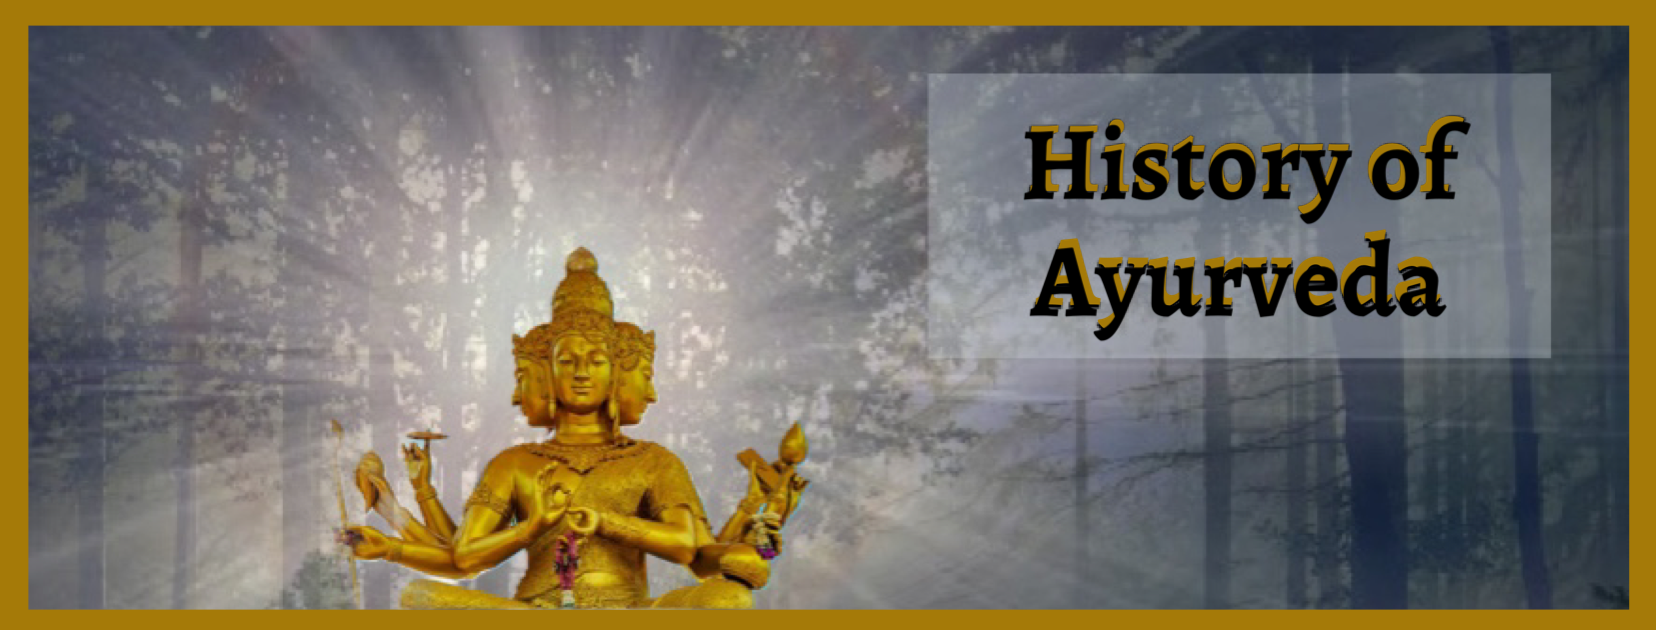 History of Ayurveda